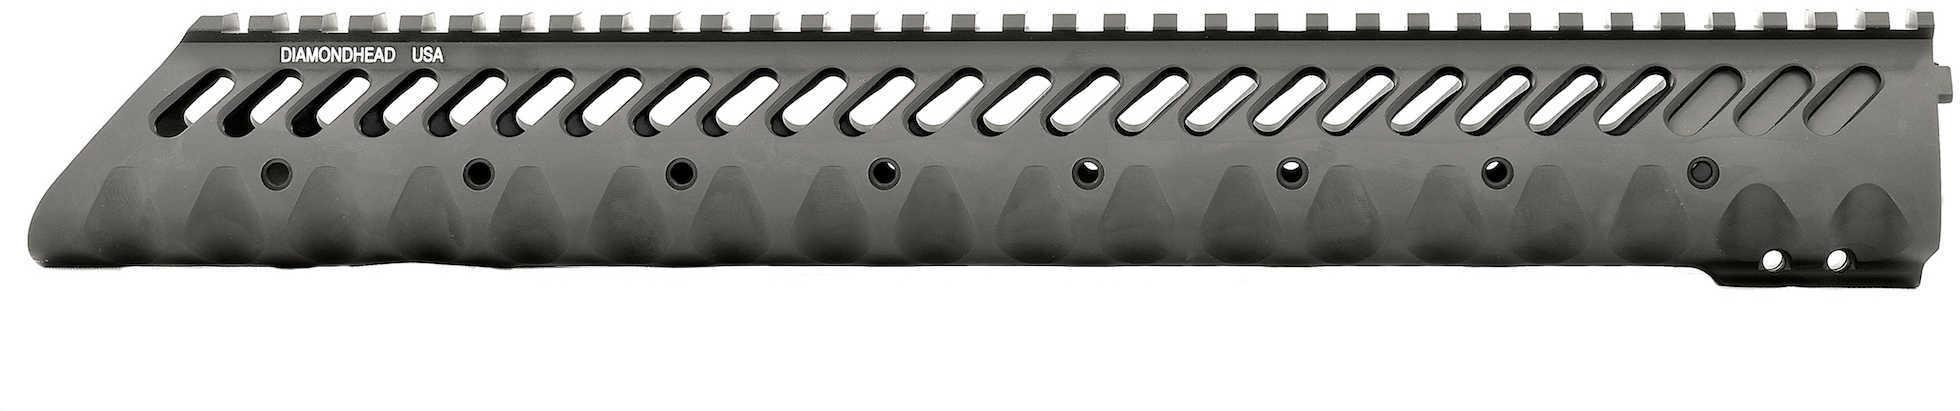 "Diamondhead USA, Inc. VRS-T Free-Floating Handguard Rail Black Free Floating AR-15 13.5"" 2231"